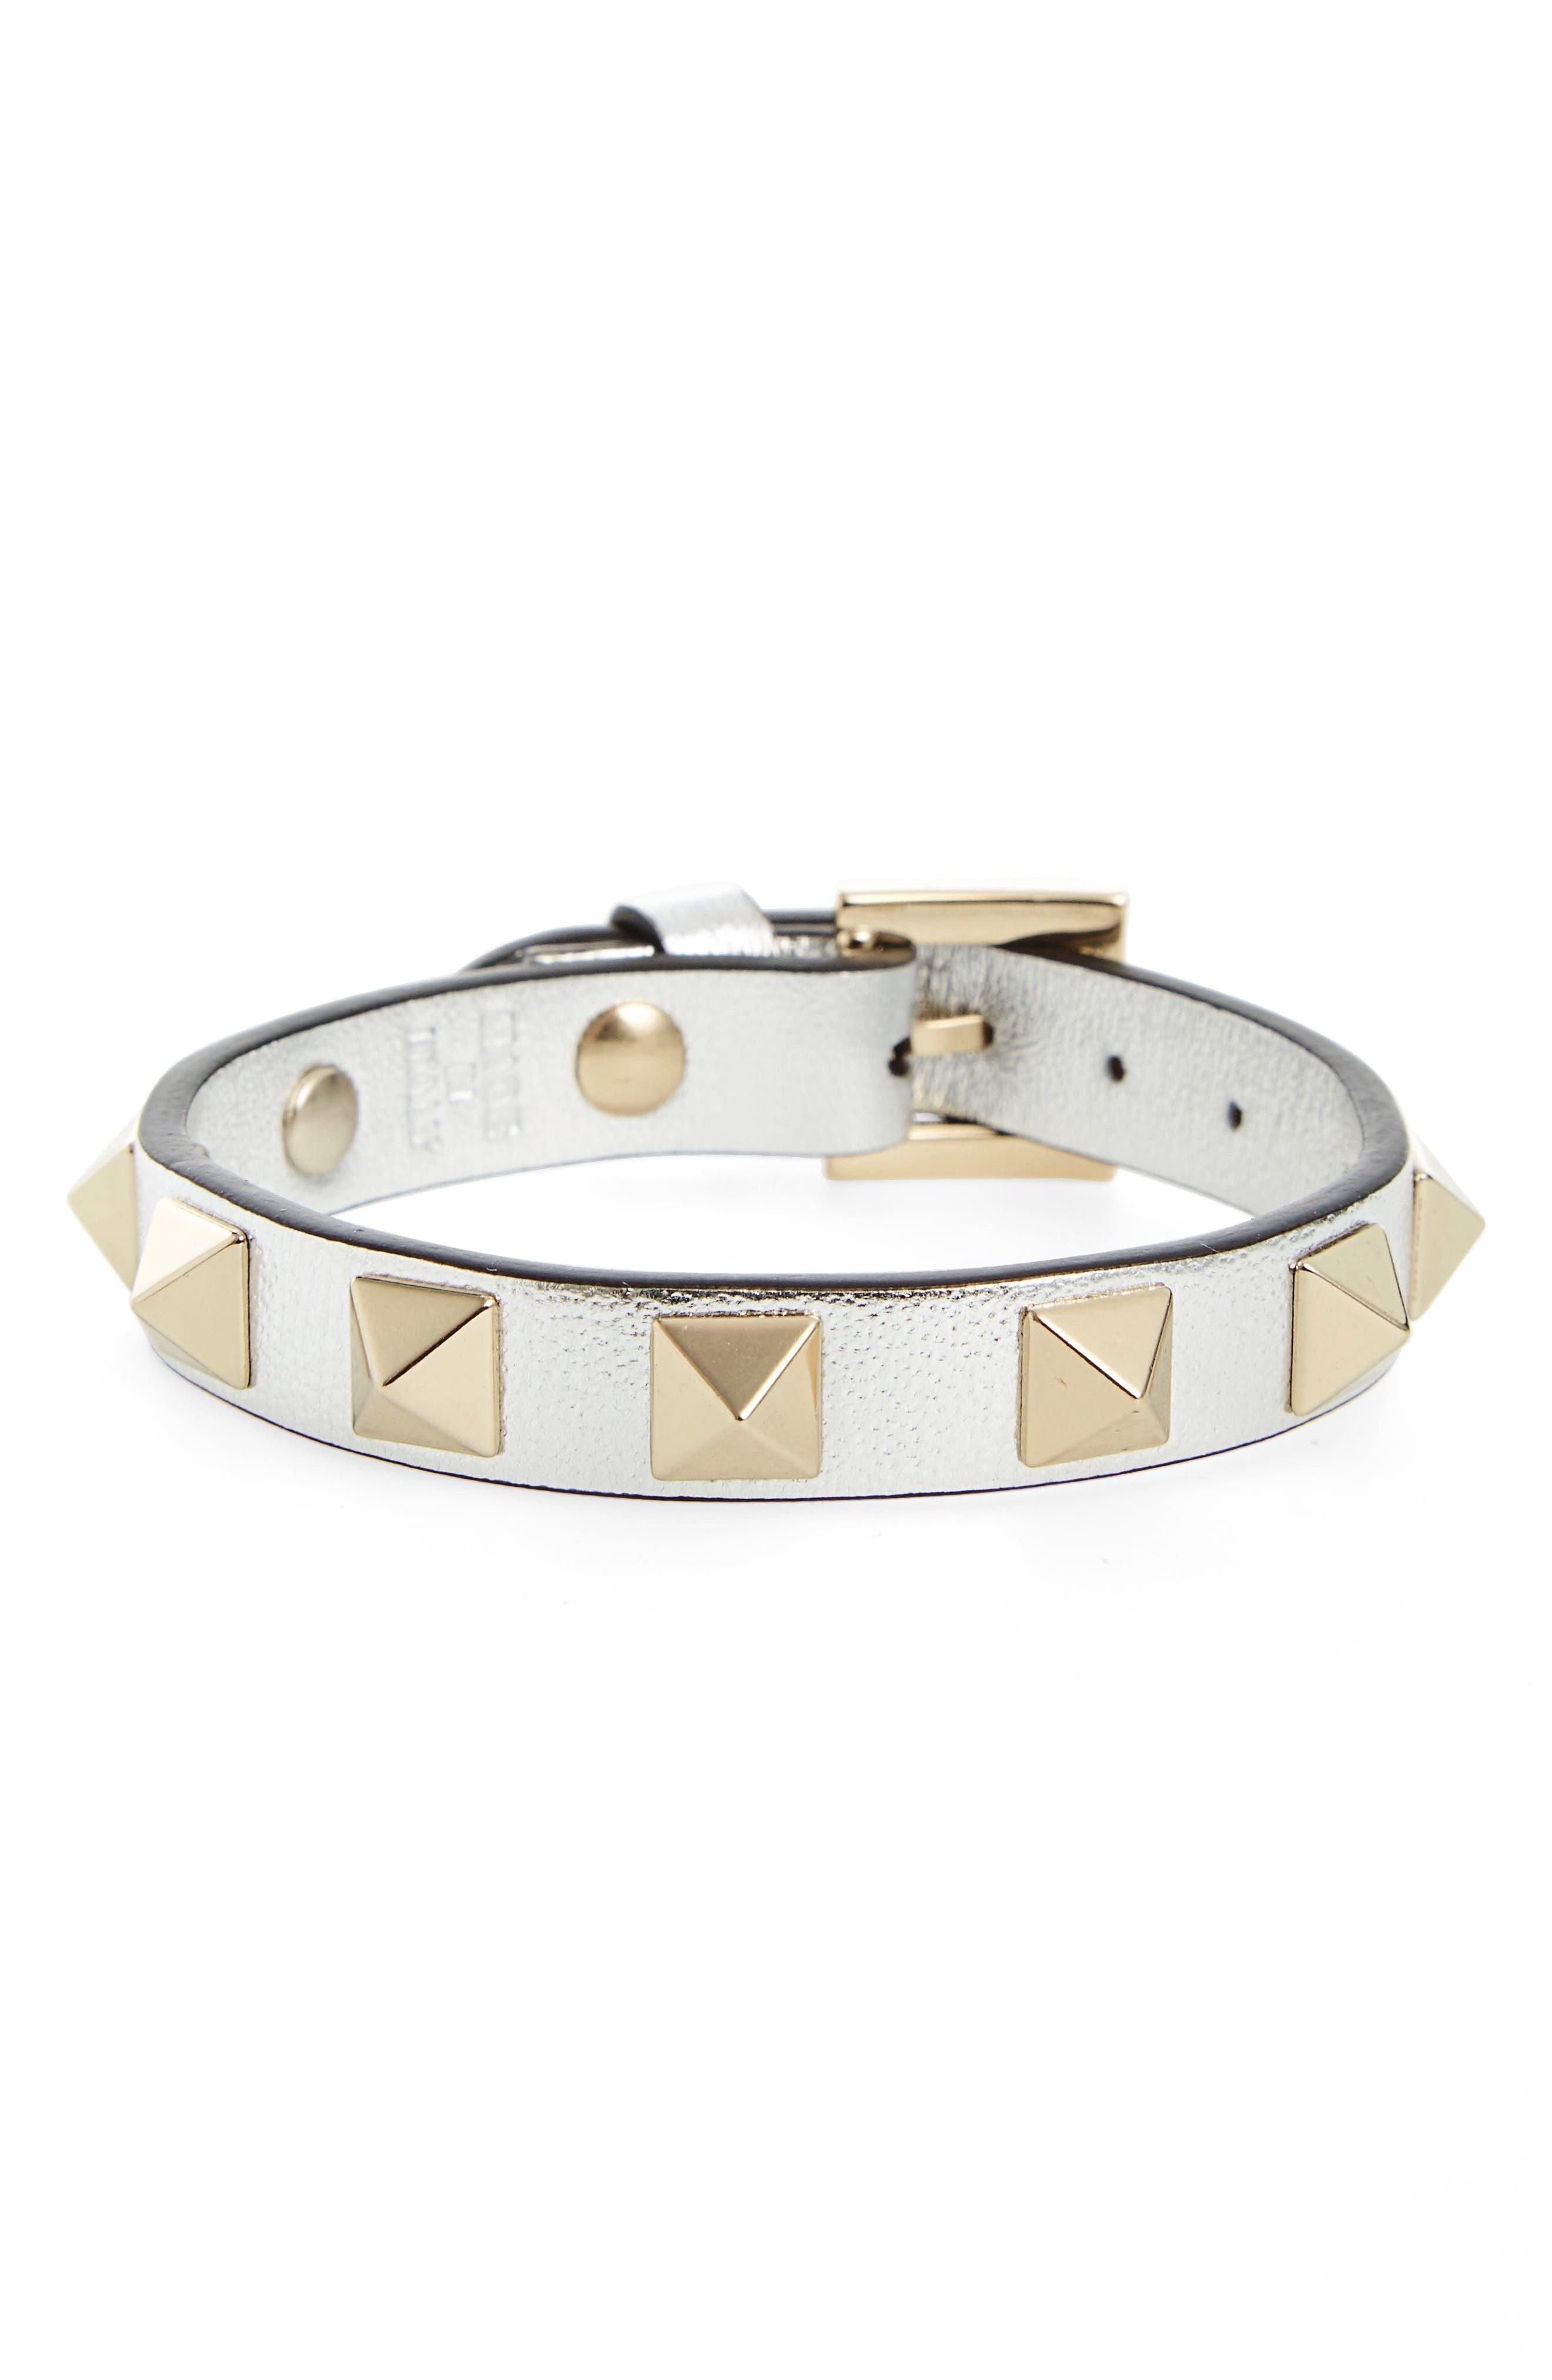 Alternate Image 1 Selected - Valentino Rockstud Leather Bracelet